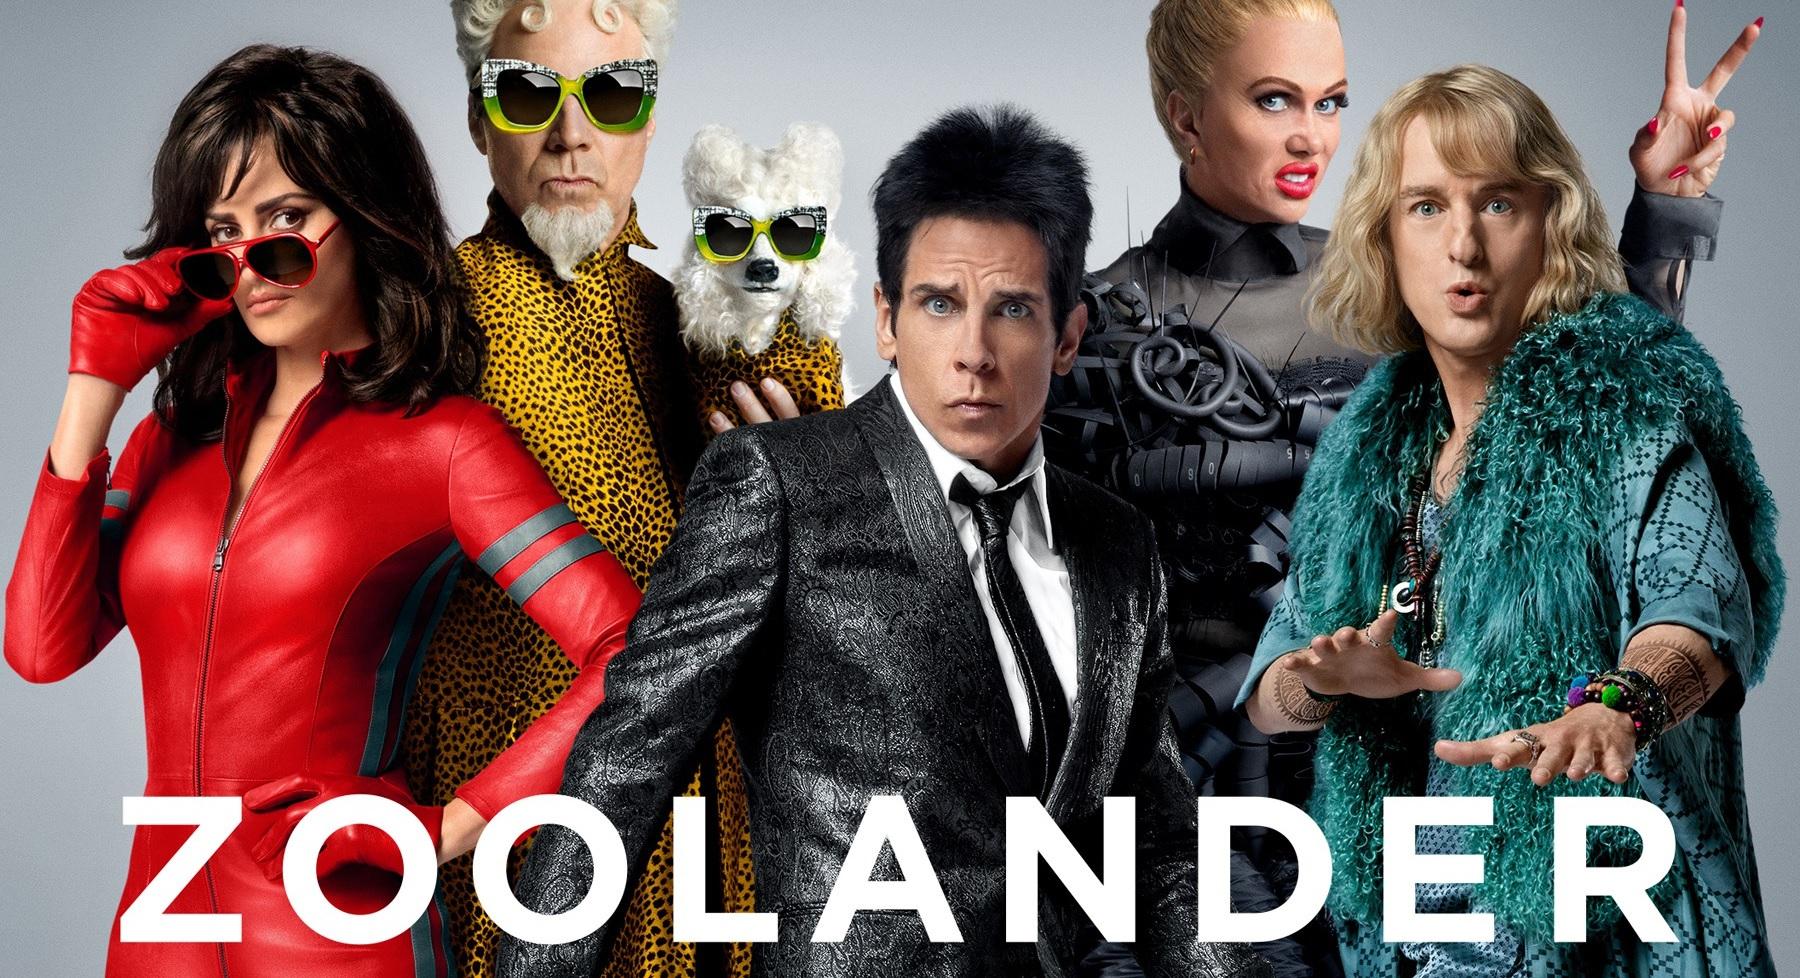 Zoolander 2 – Throwback Thursday